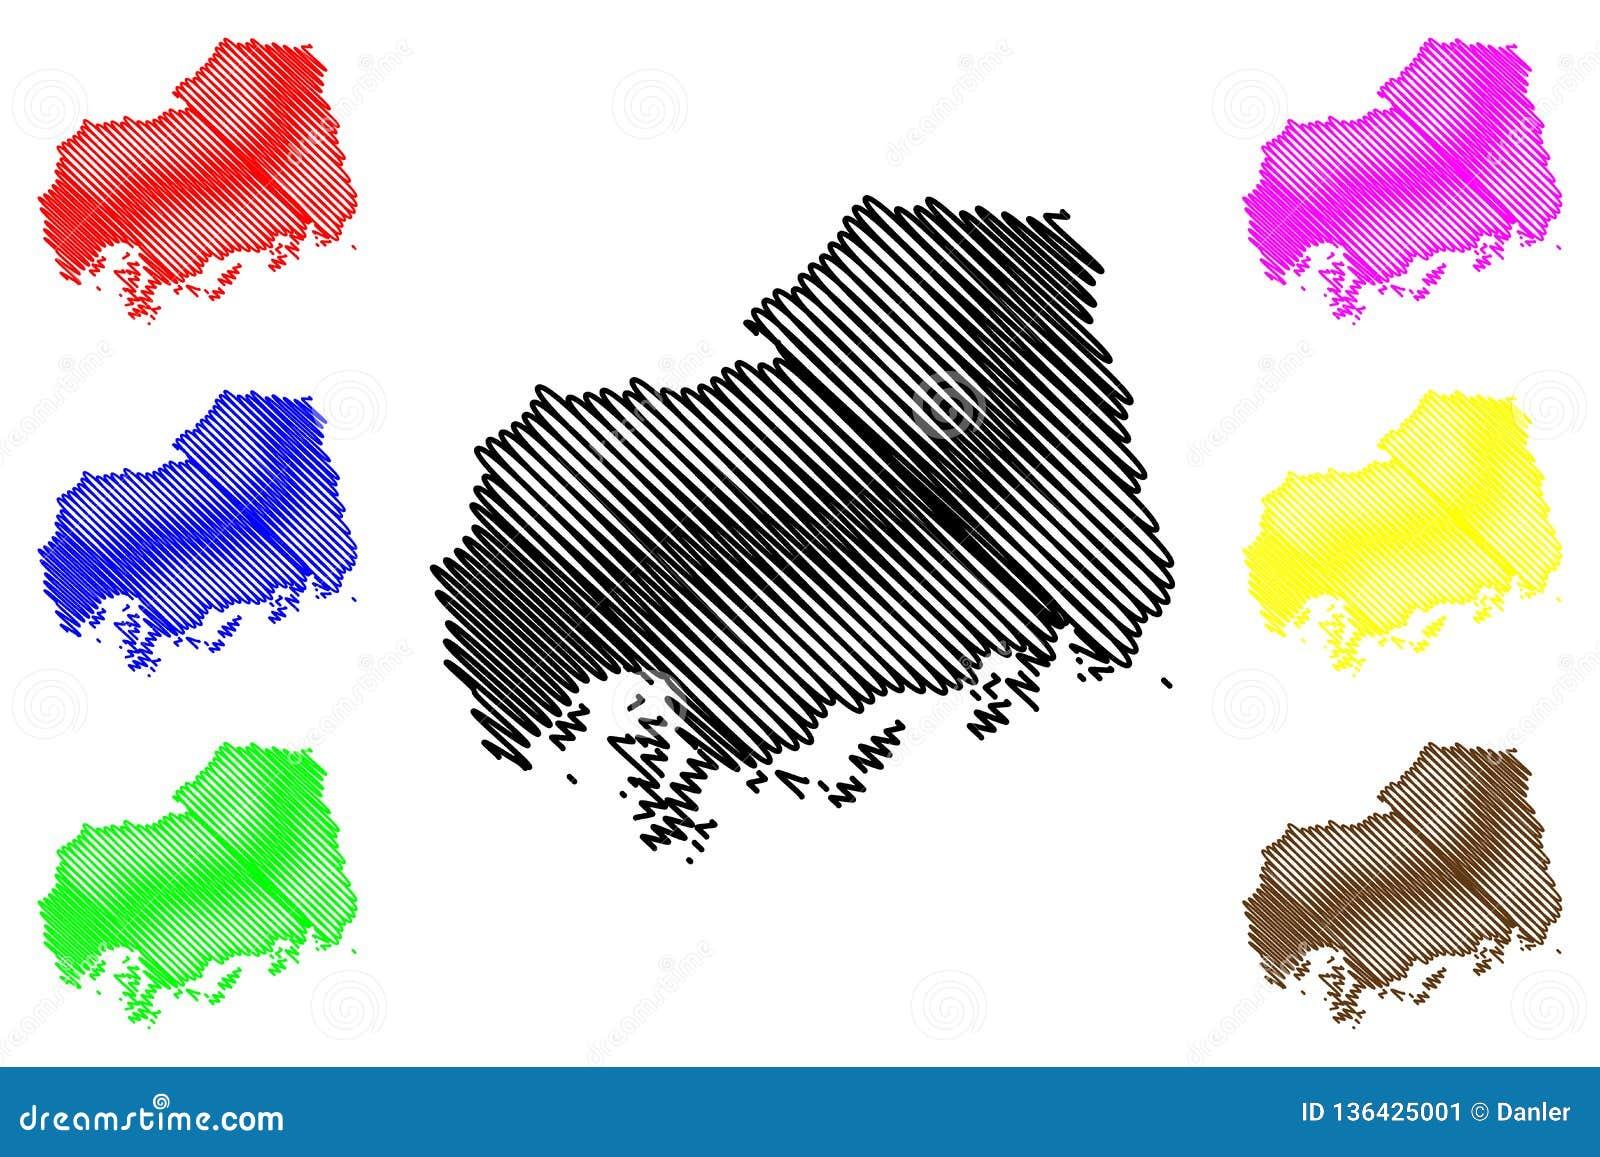 Hiroshima Prefecture Map Vector Stock Vector - Illustration of japan ...